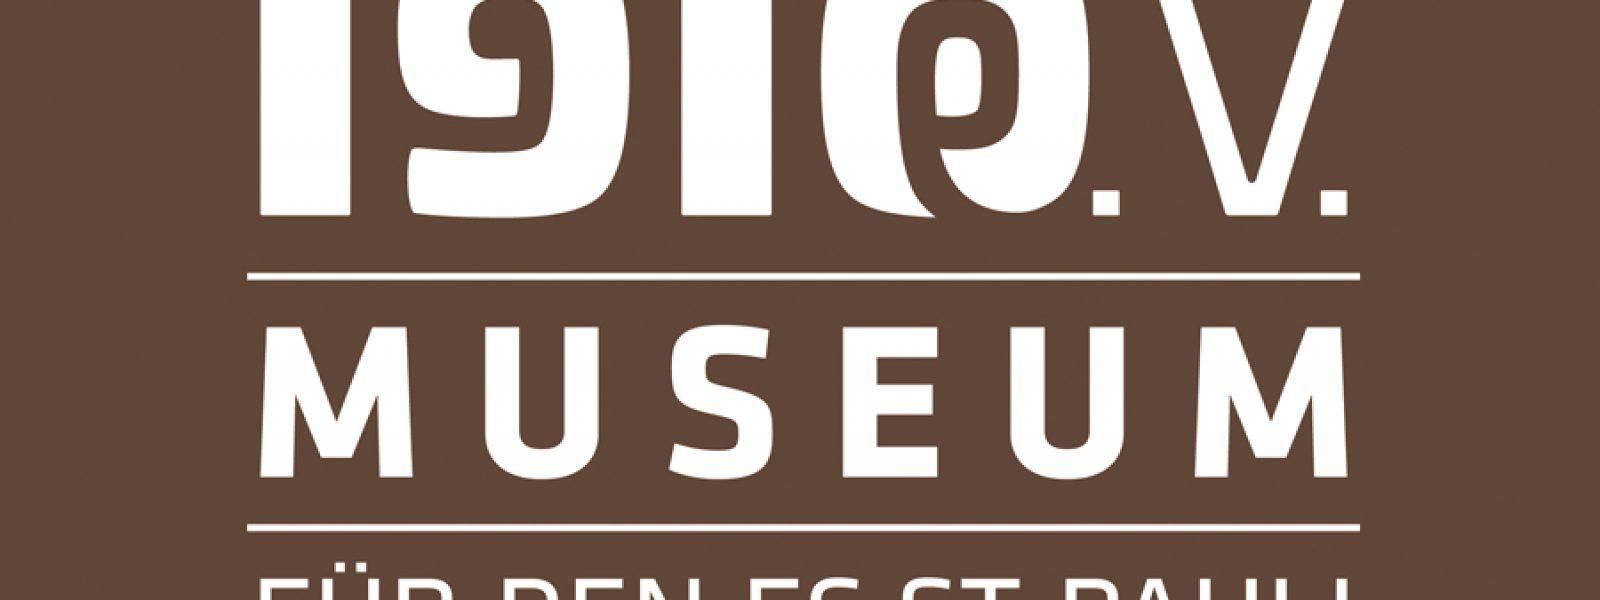 Logo 1910 - Museum für den FC St. Pauli e.V.. Gestaltung: DJ DSL